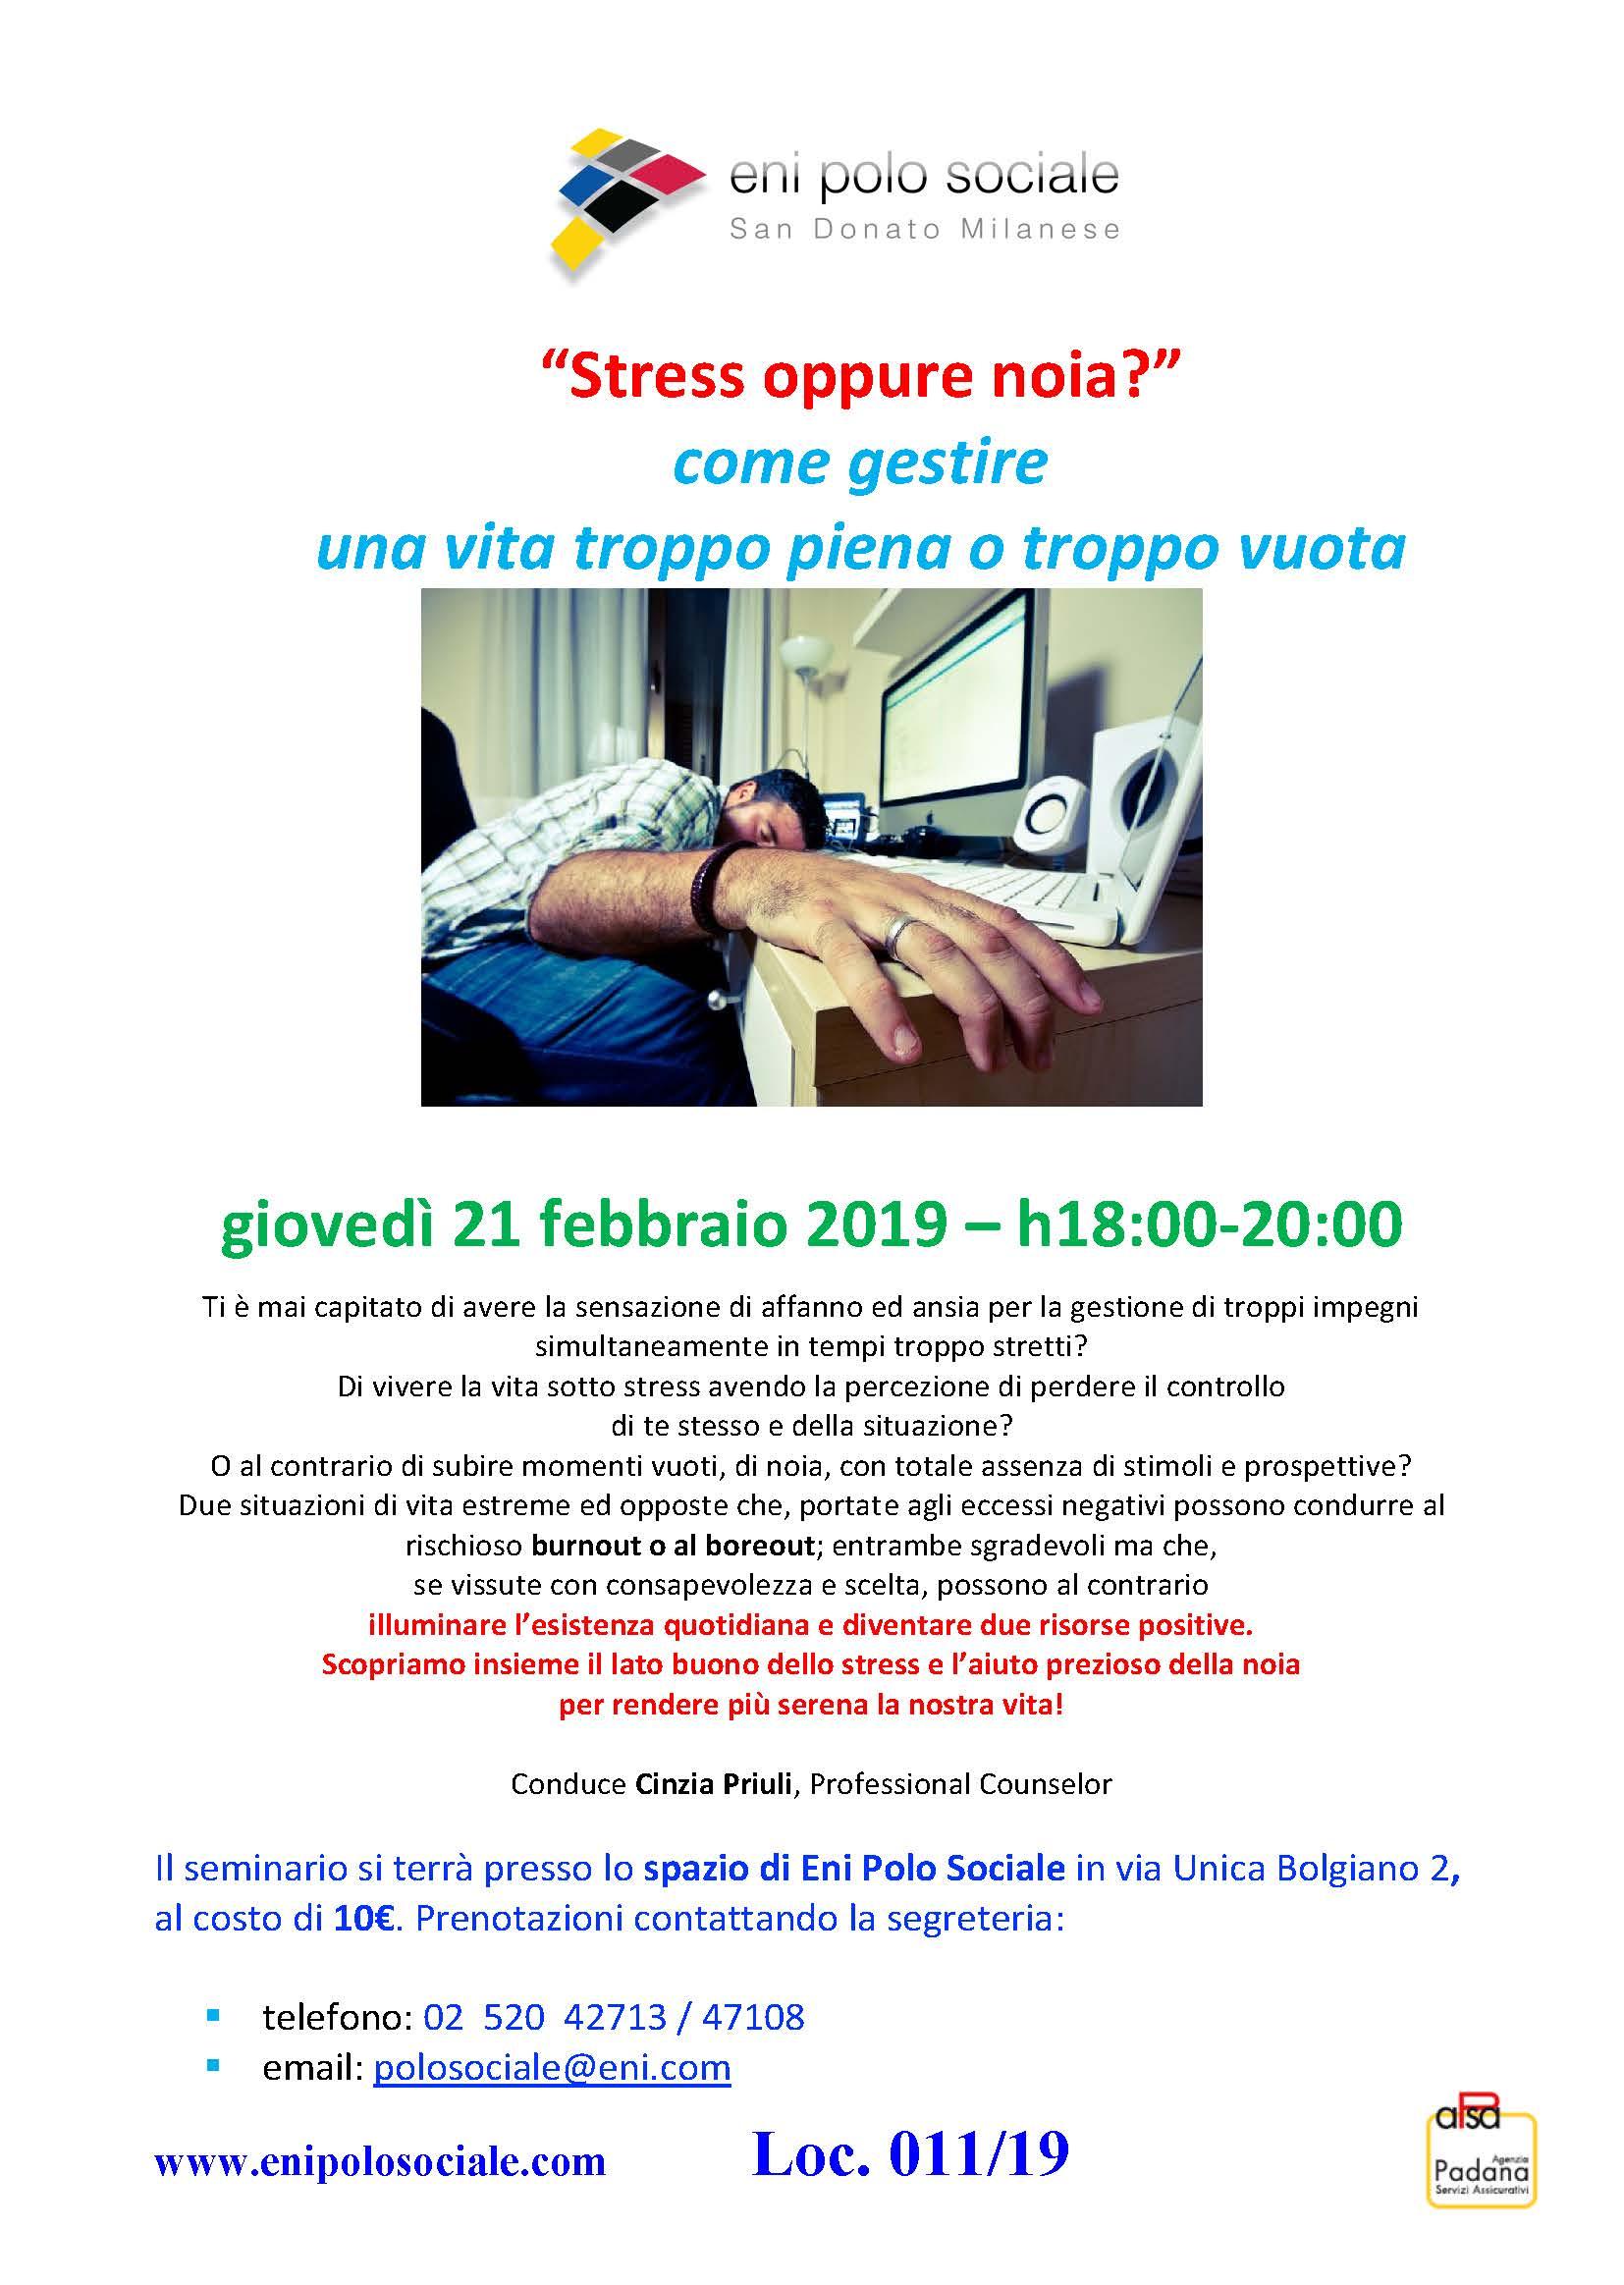 Stress oppure noia 21 febb 2019